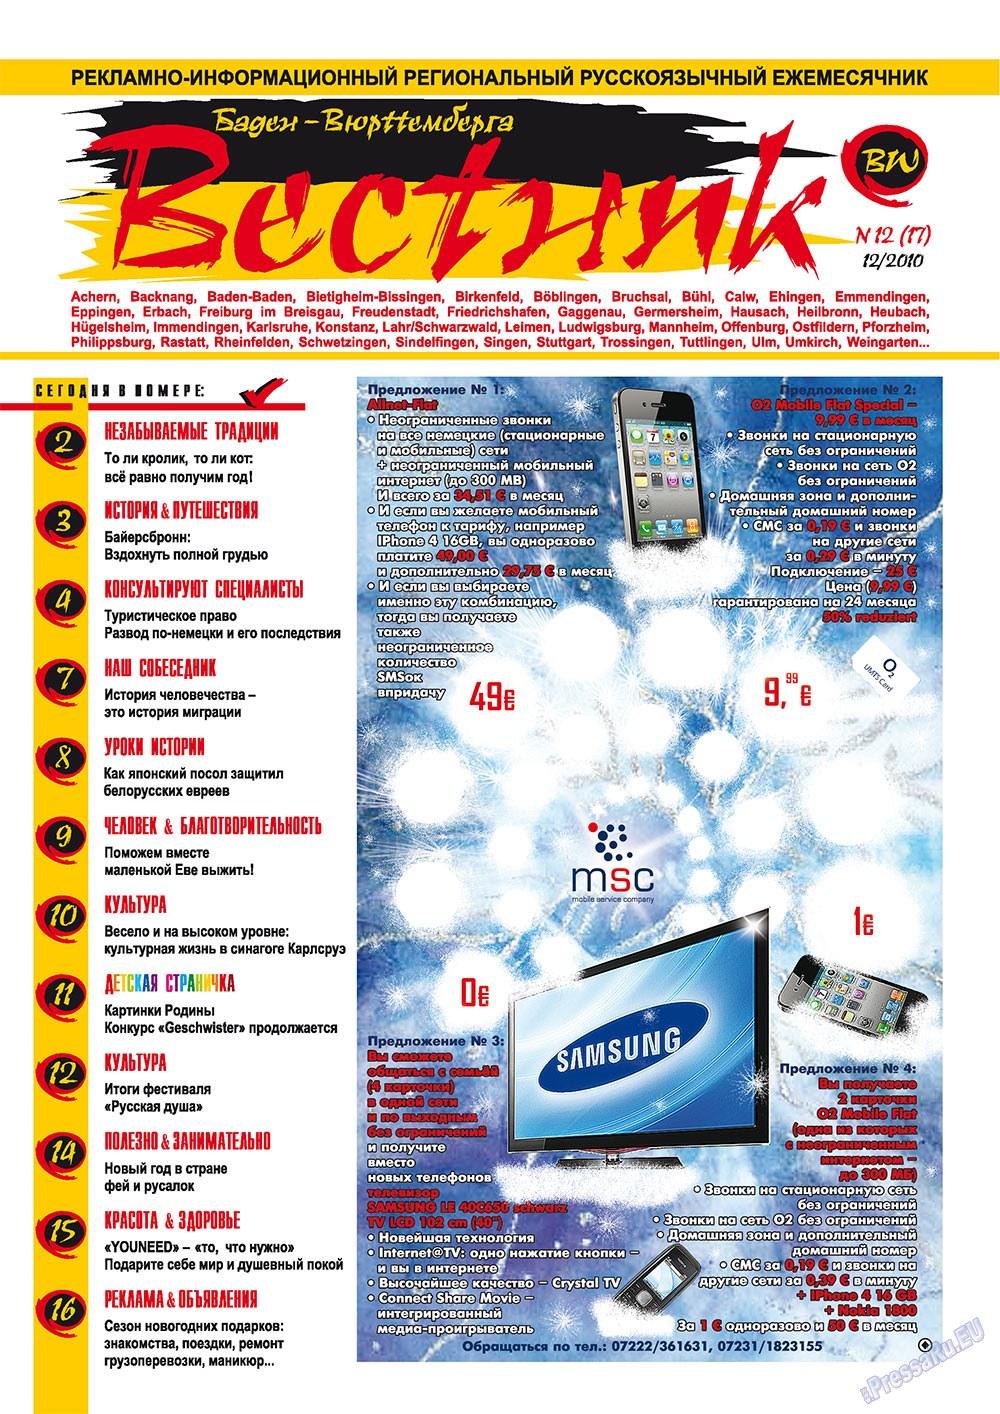 Вестник-info (журнал). 2010 год, номер 12, стр. 1